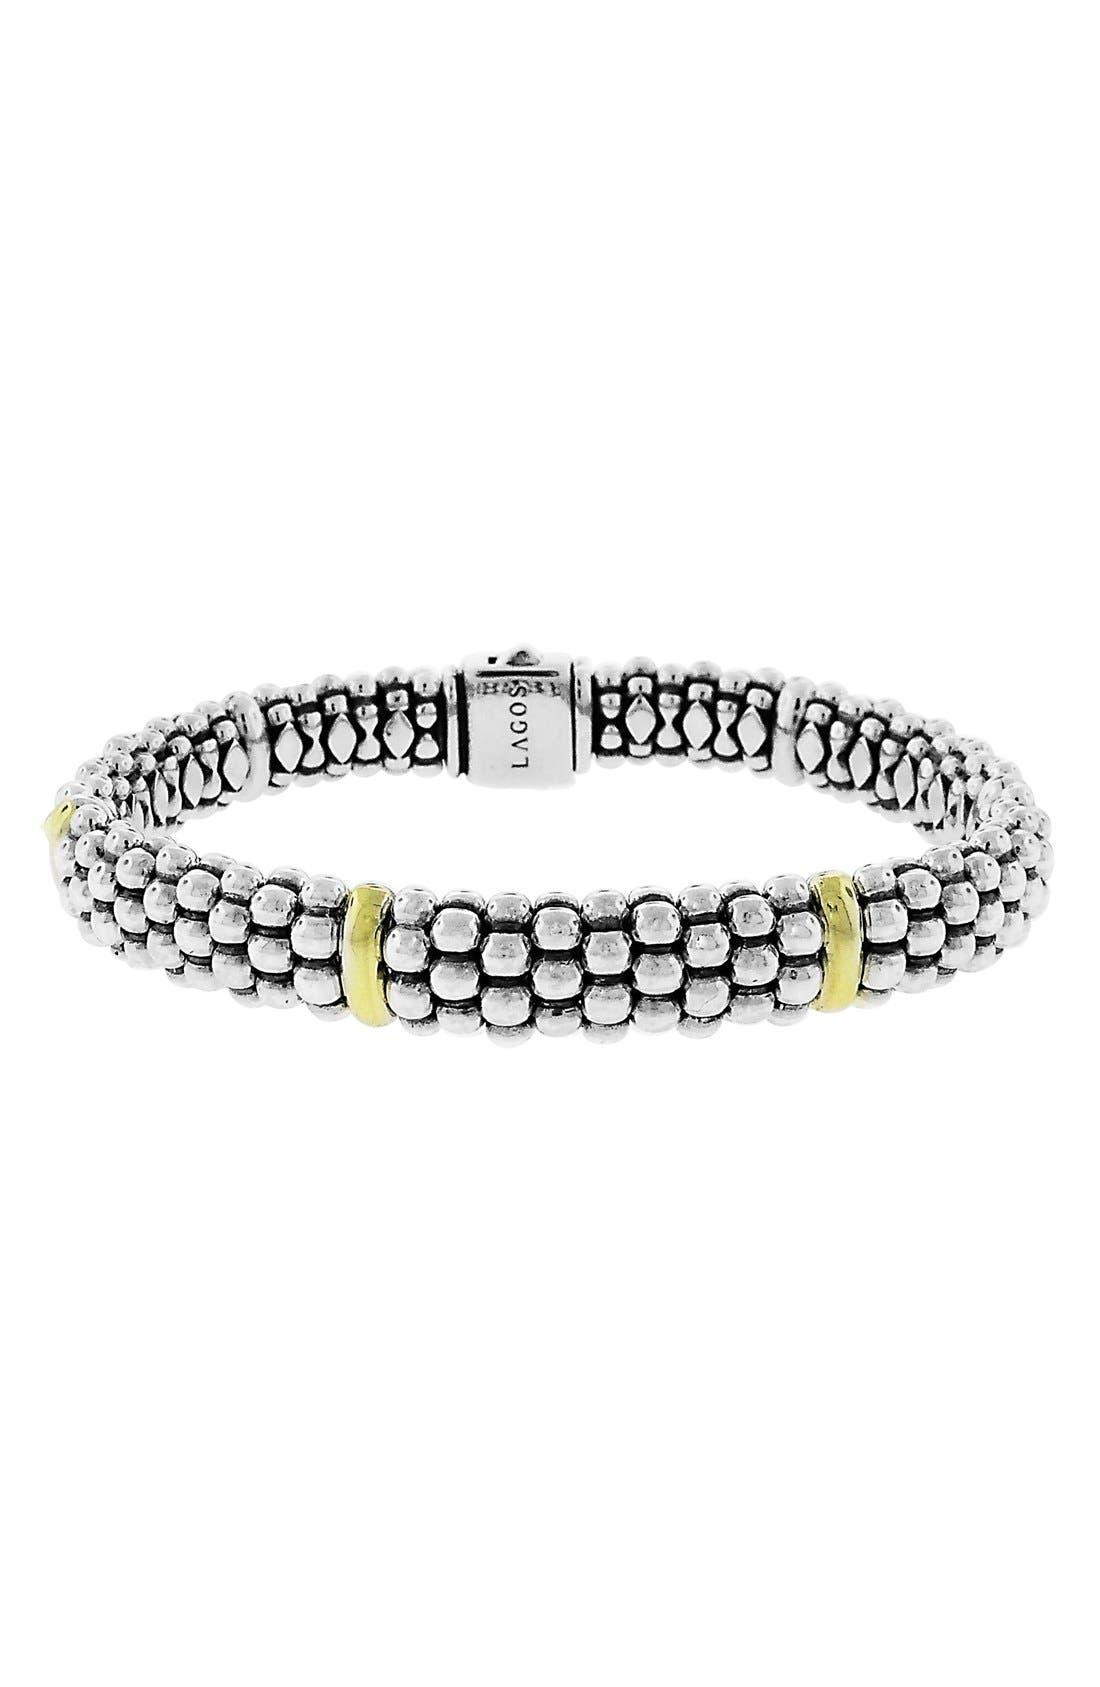 Caviar Rope Bracelet,                         Main,                         color, SILVER/ GOLD